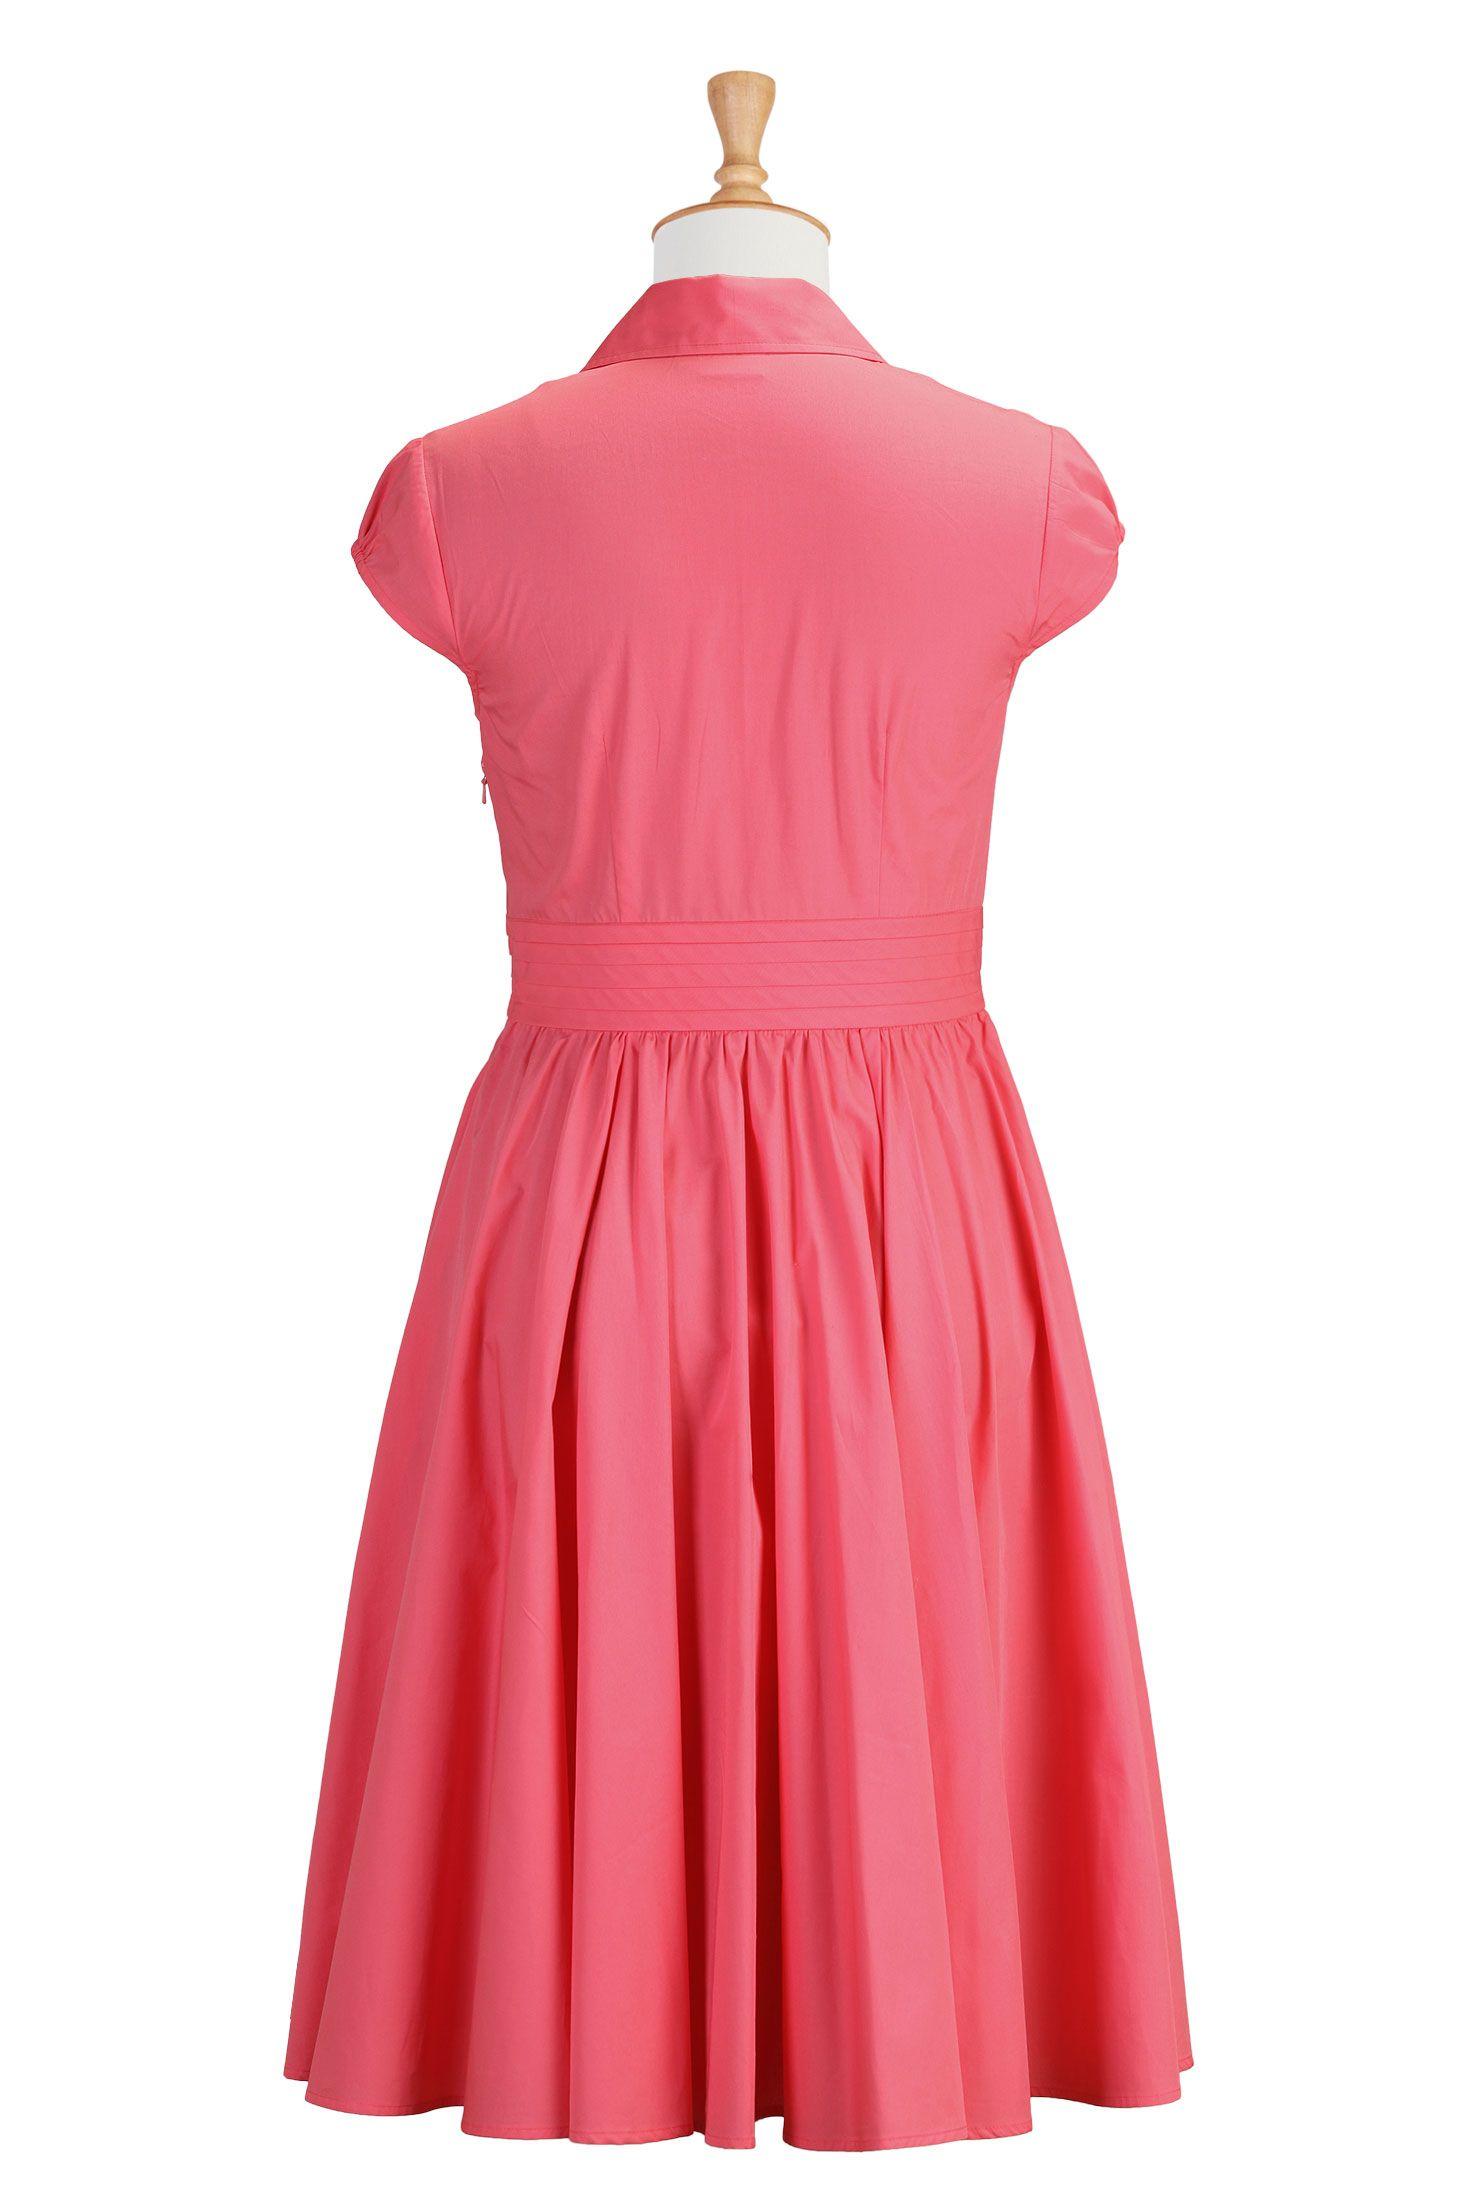 Sunkist Coral Cotton Poplin Dresses, Full Circle Skirt Dresses Shop women's designer dress: Women's stylish dress, Missy, Plus, Petite, Tall...